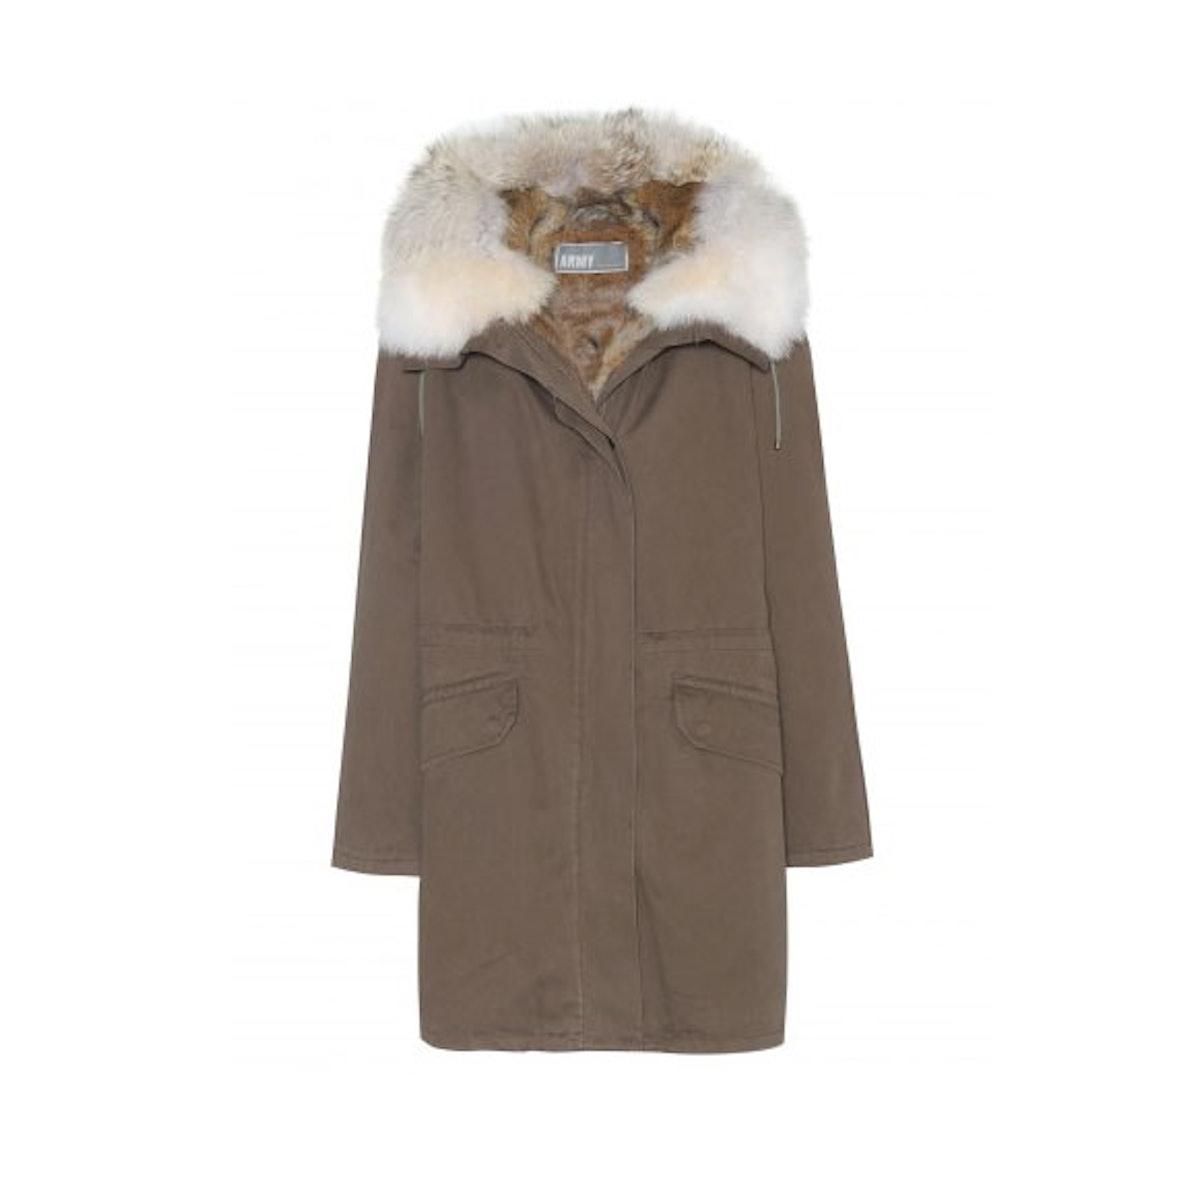 Army by Yves Salomon coat